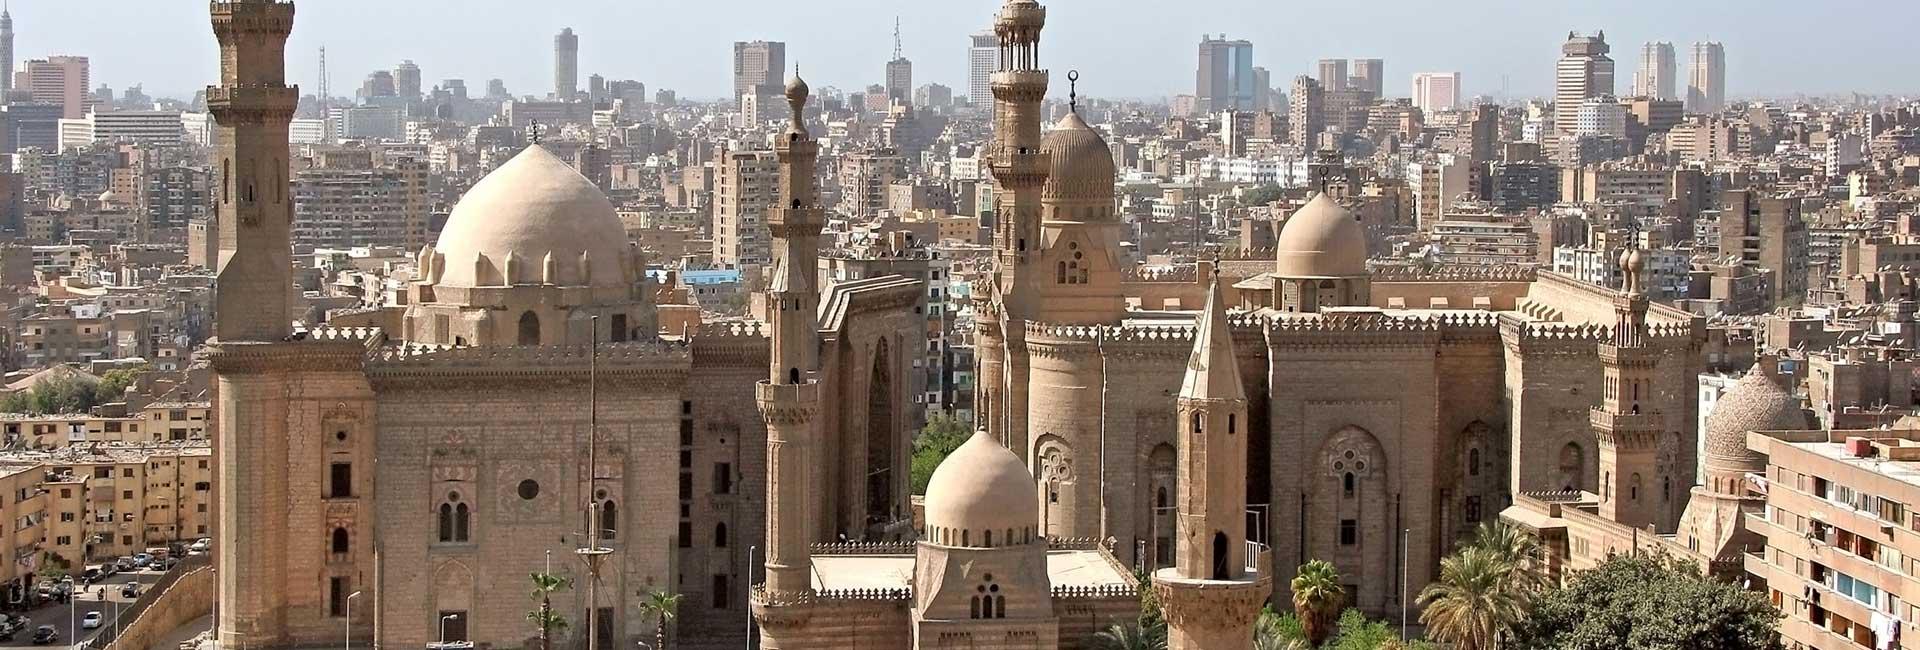 Cairo's Palaces